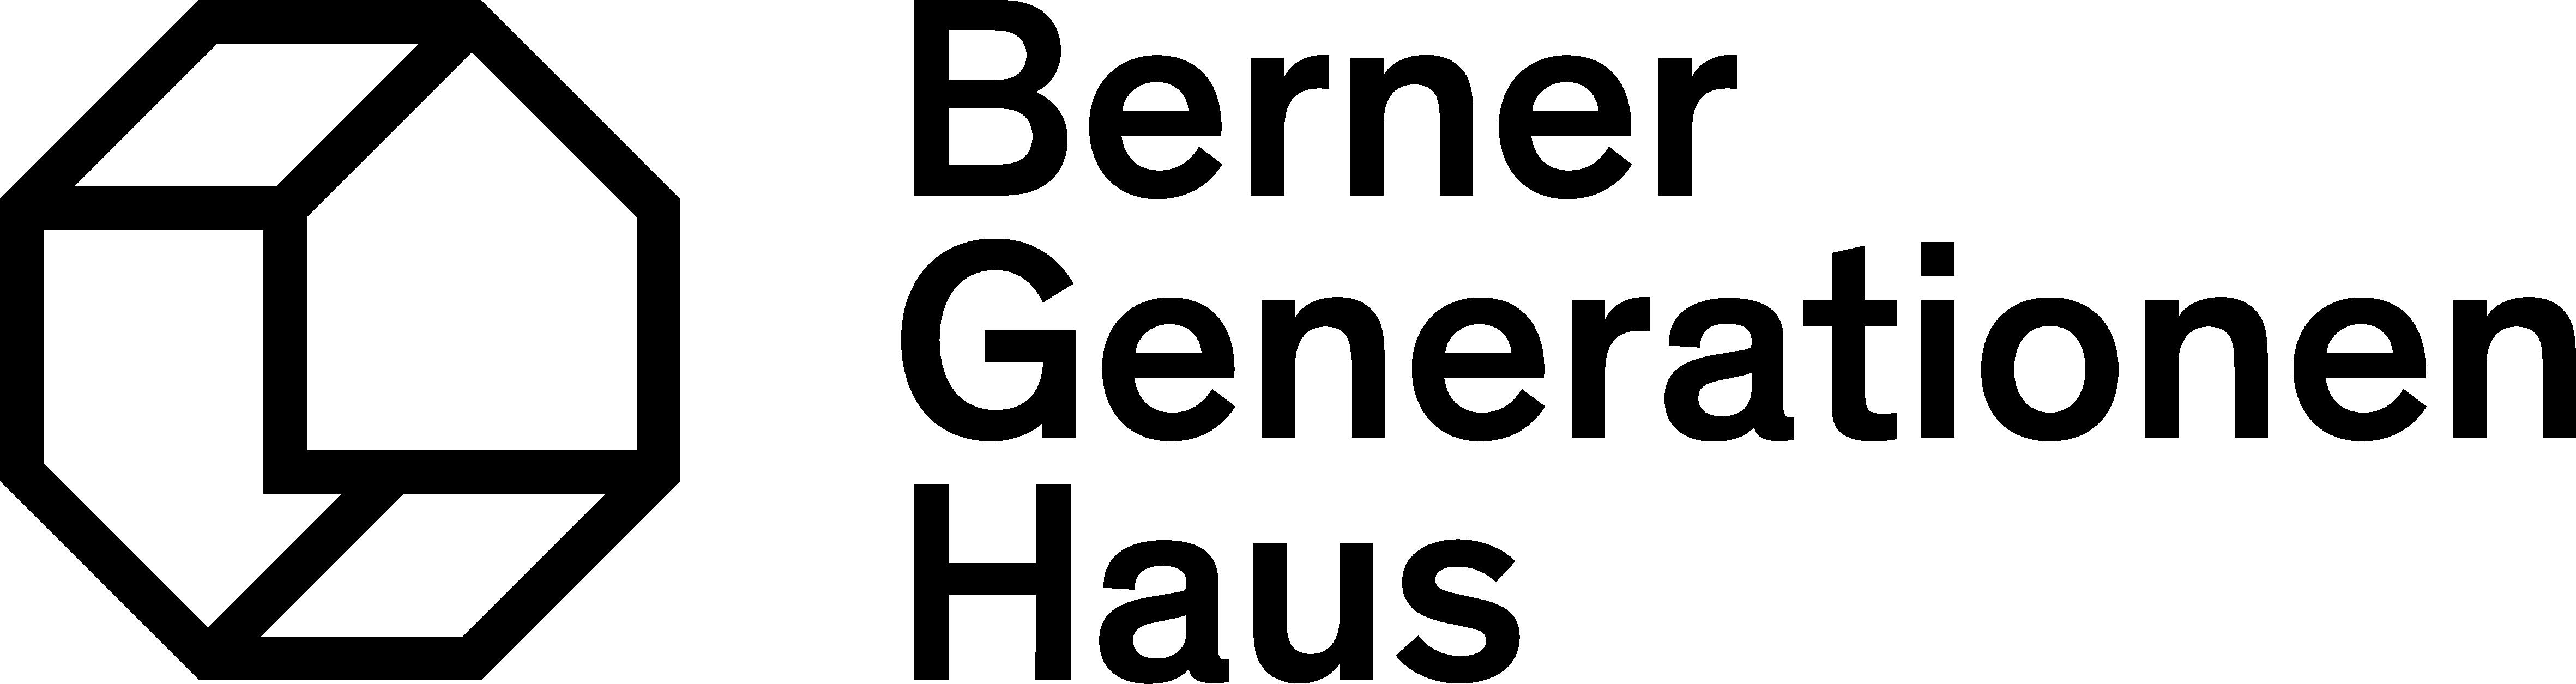 Logo Berner Generationenhaus